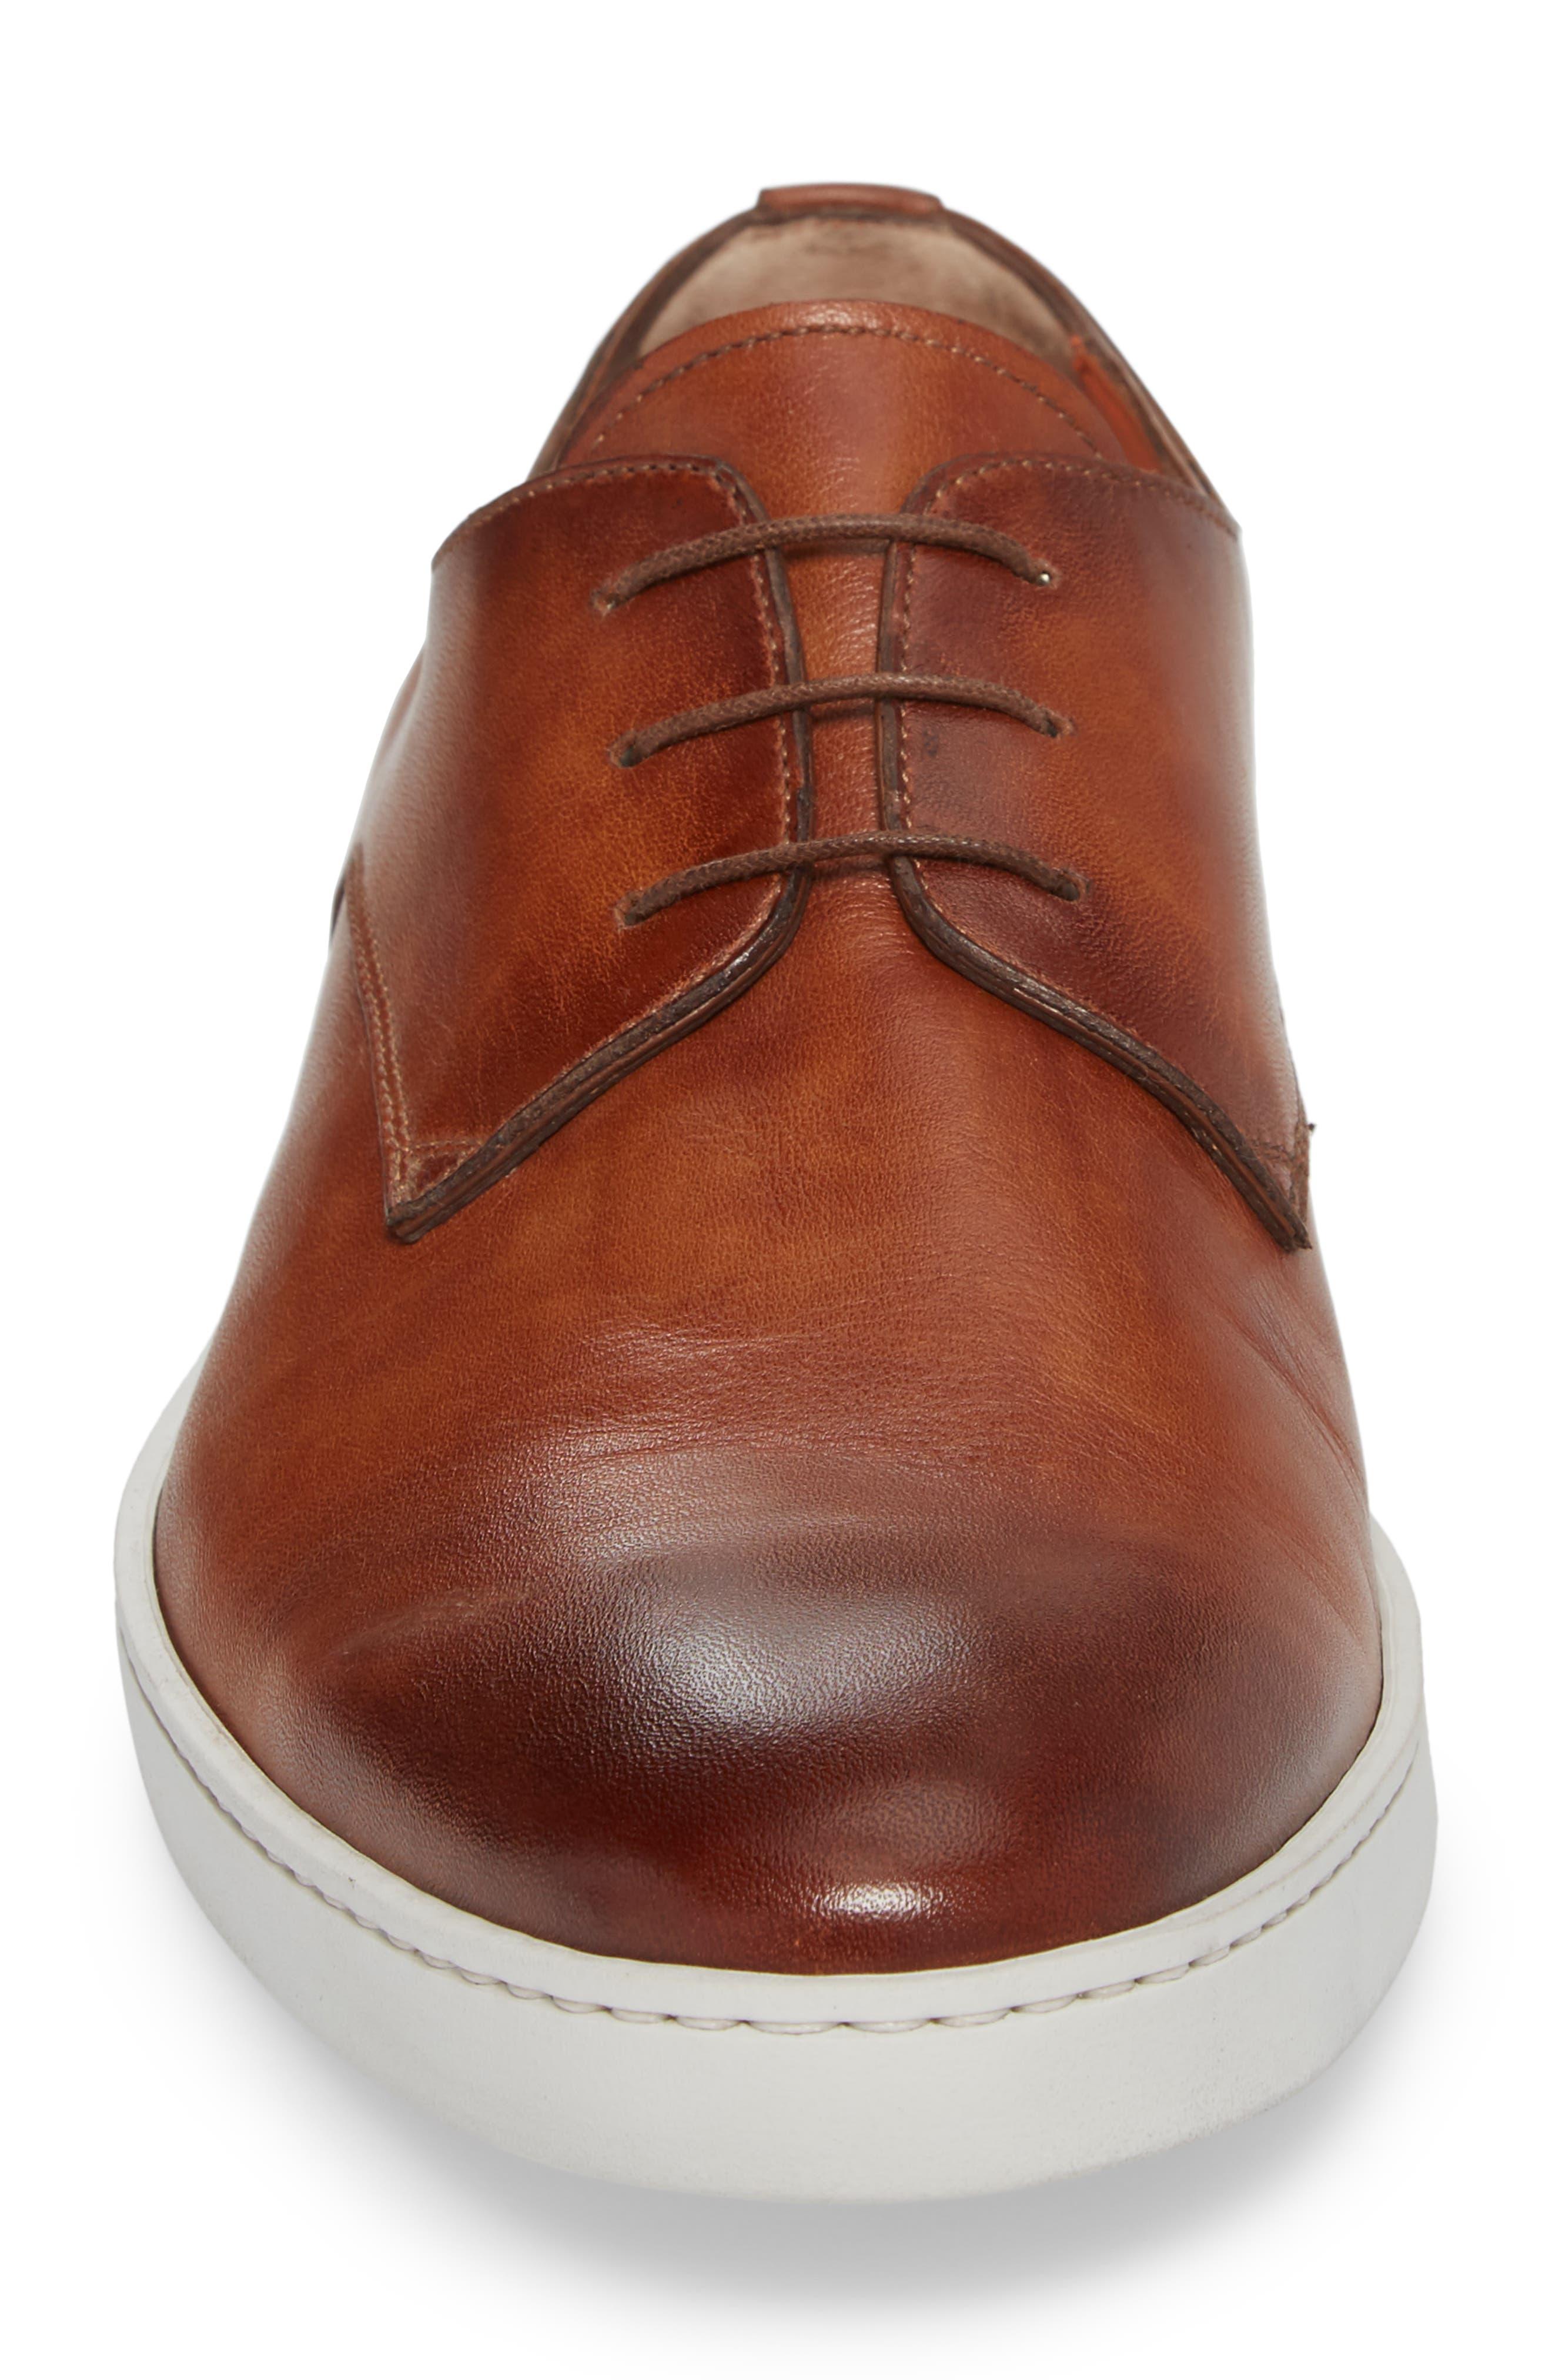 Doyle Plain Toe Derby Sneaker,                             Alternate thumbnail 4, color,                             TAN